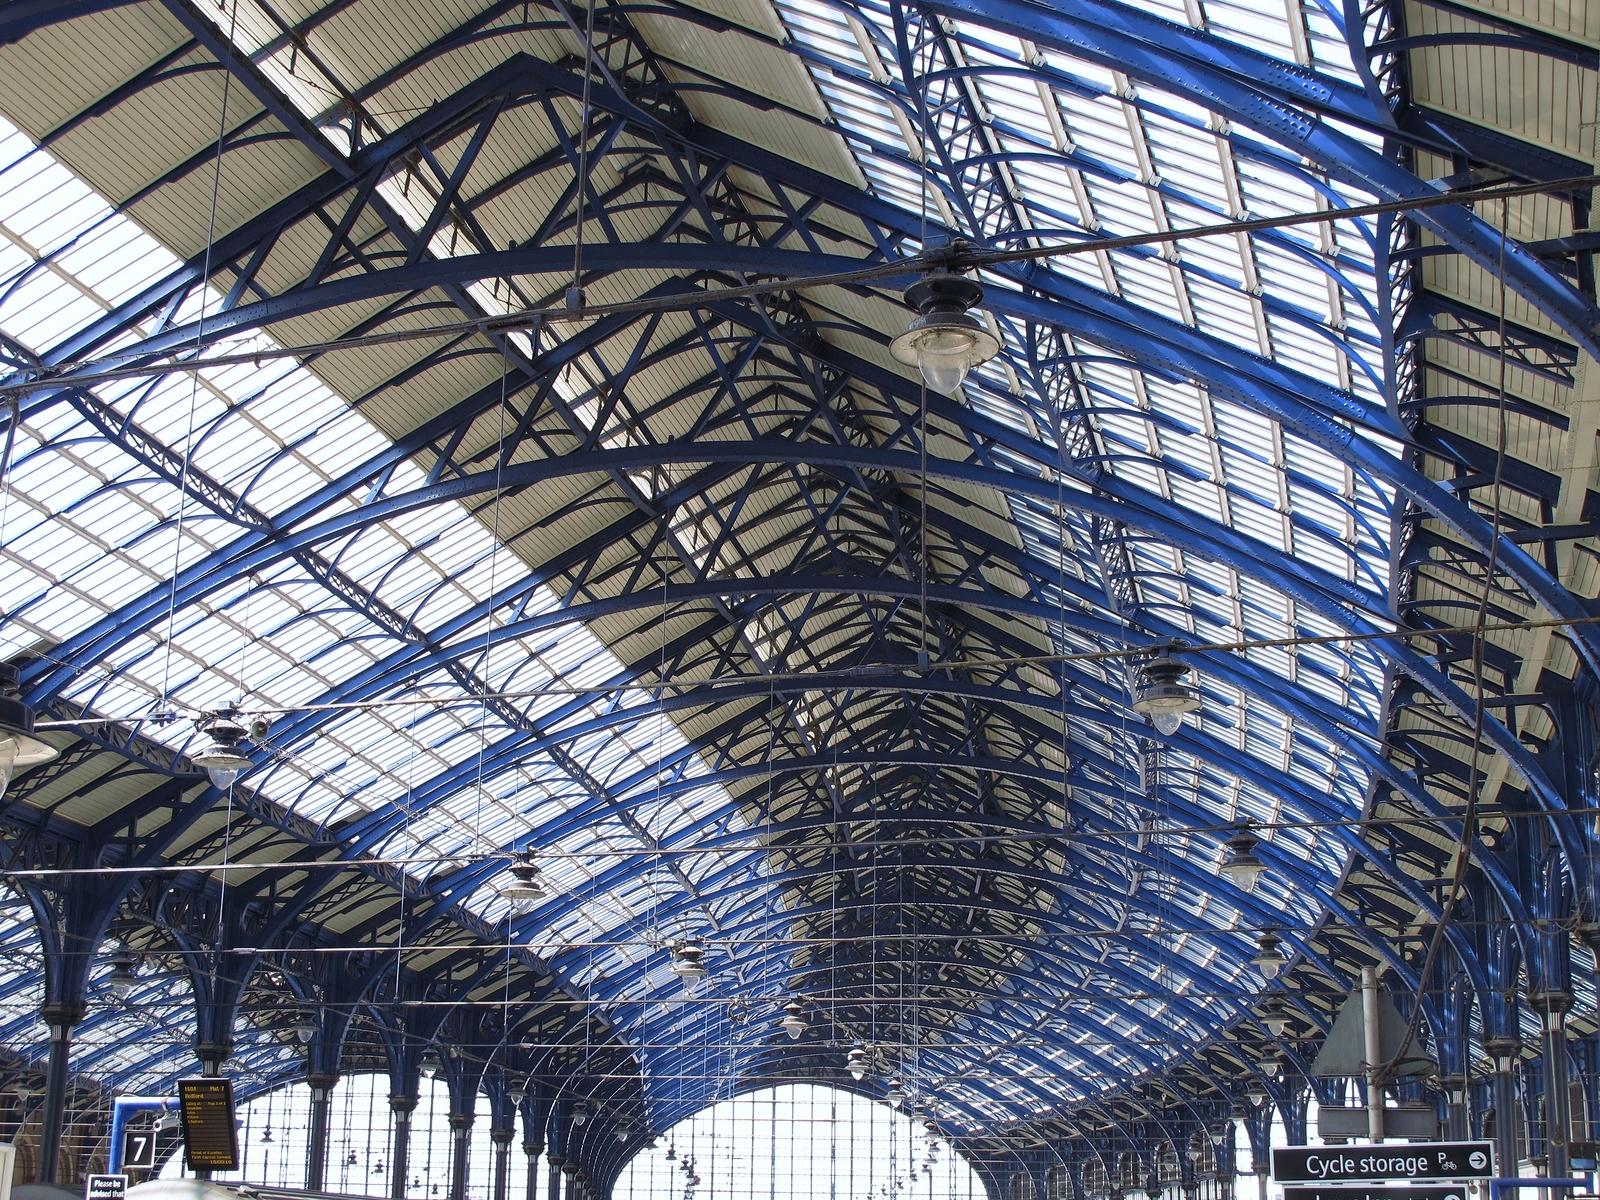 163 14 5 Million Repairs To Carlisle Station Roof Near Finish